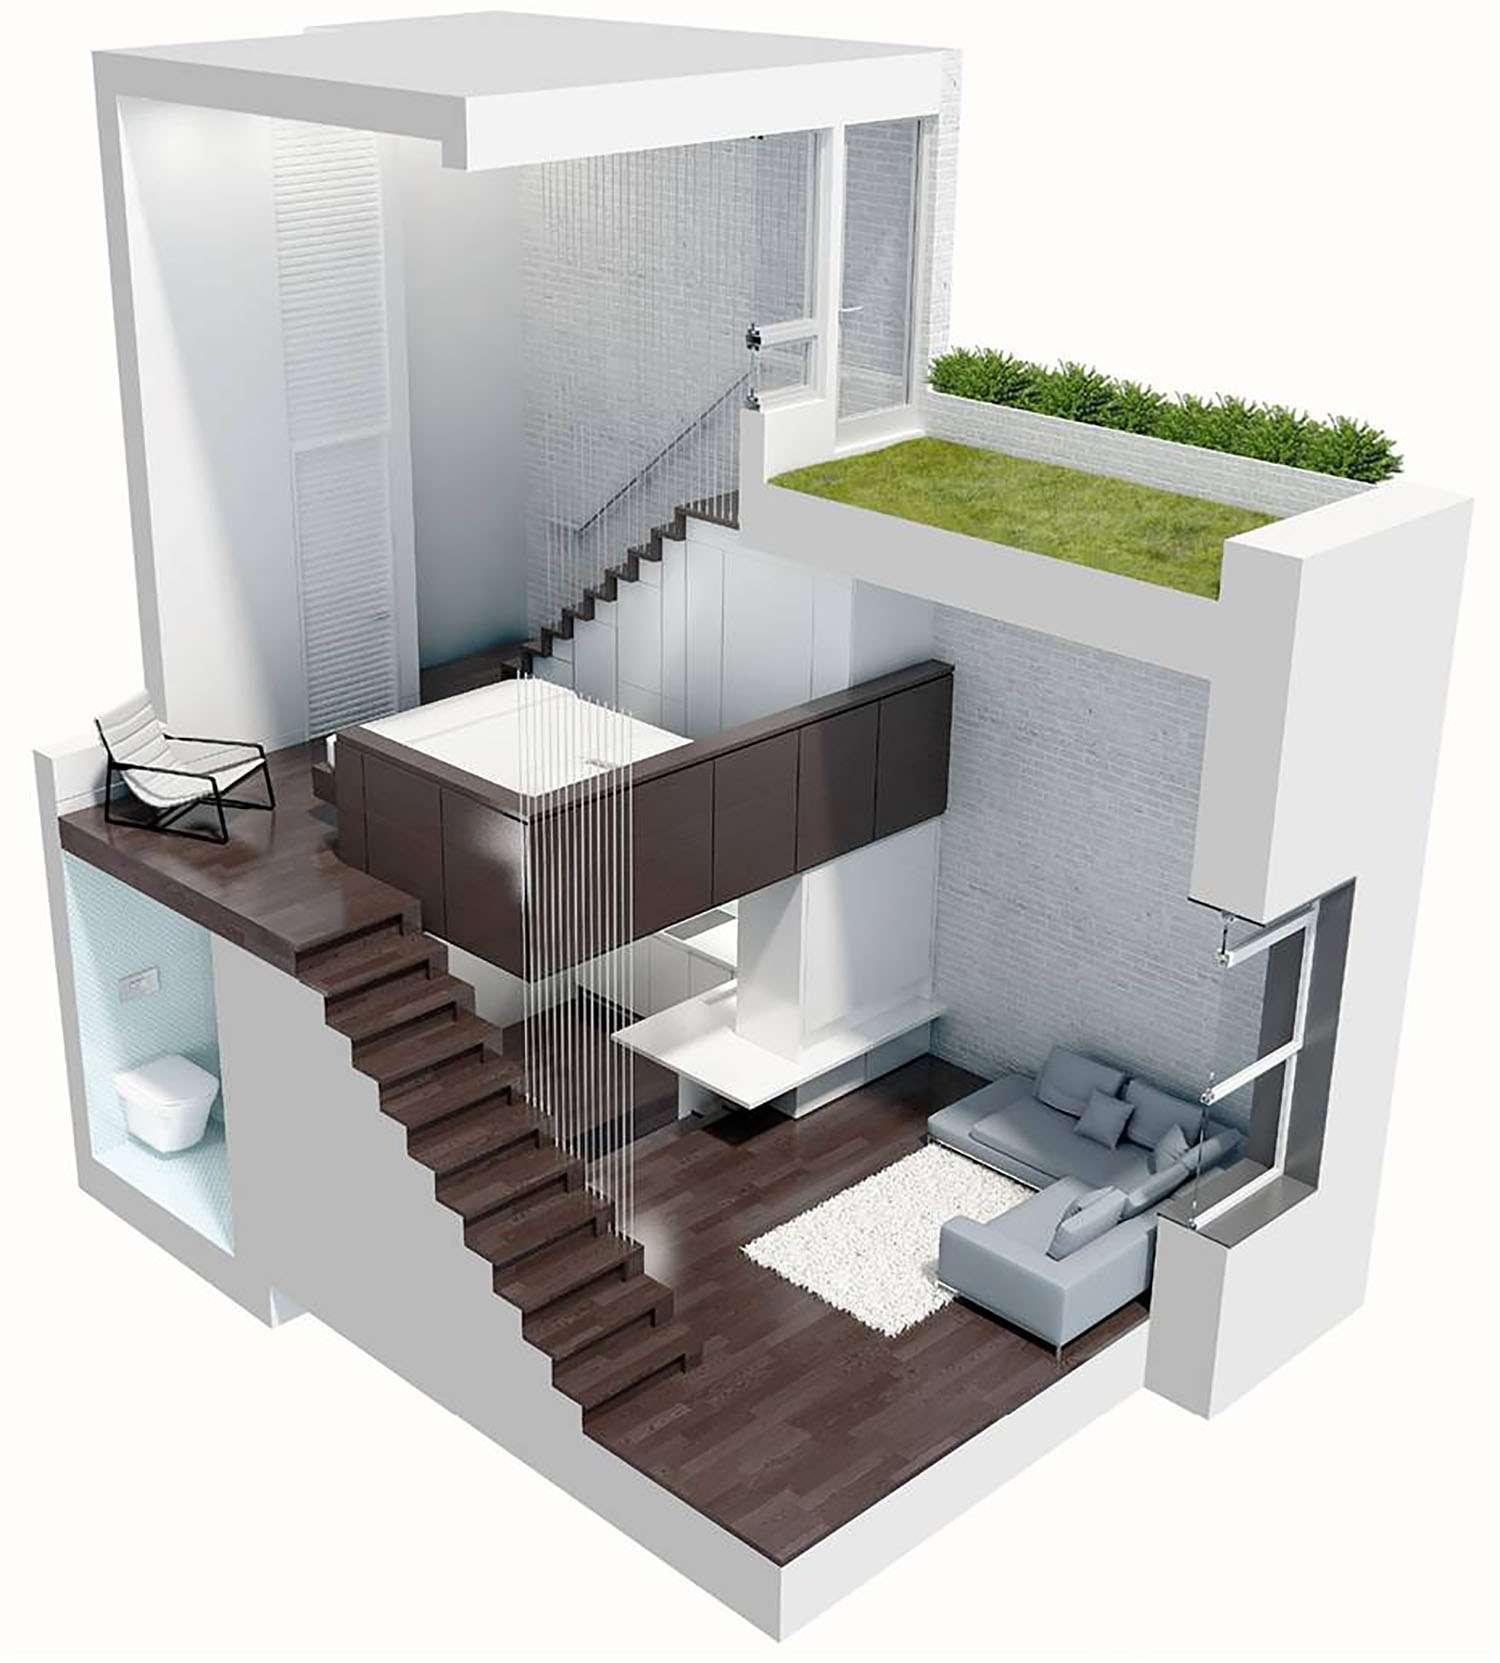 manhattan microloft specht architects axonometric rendering